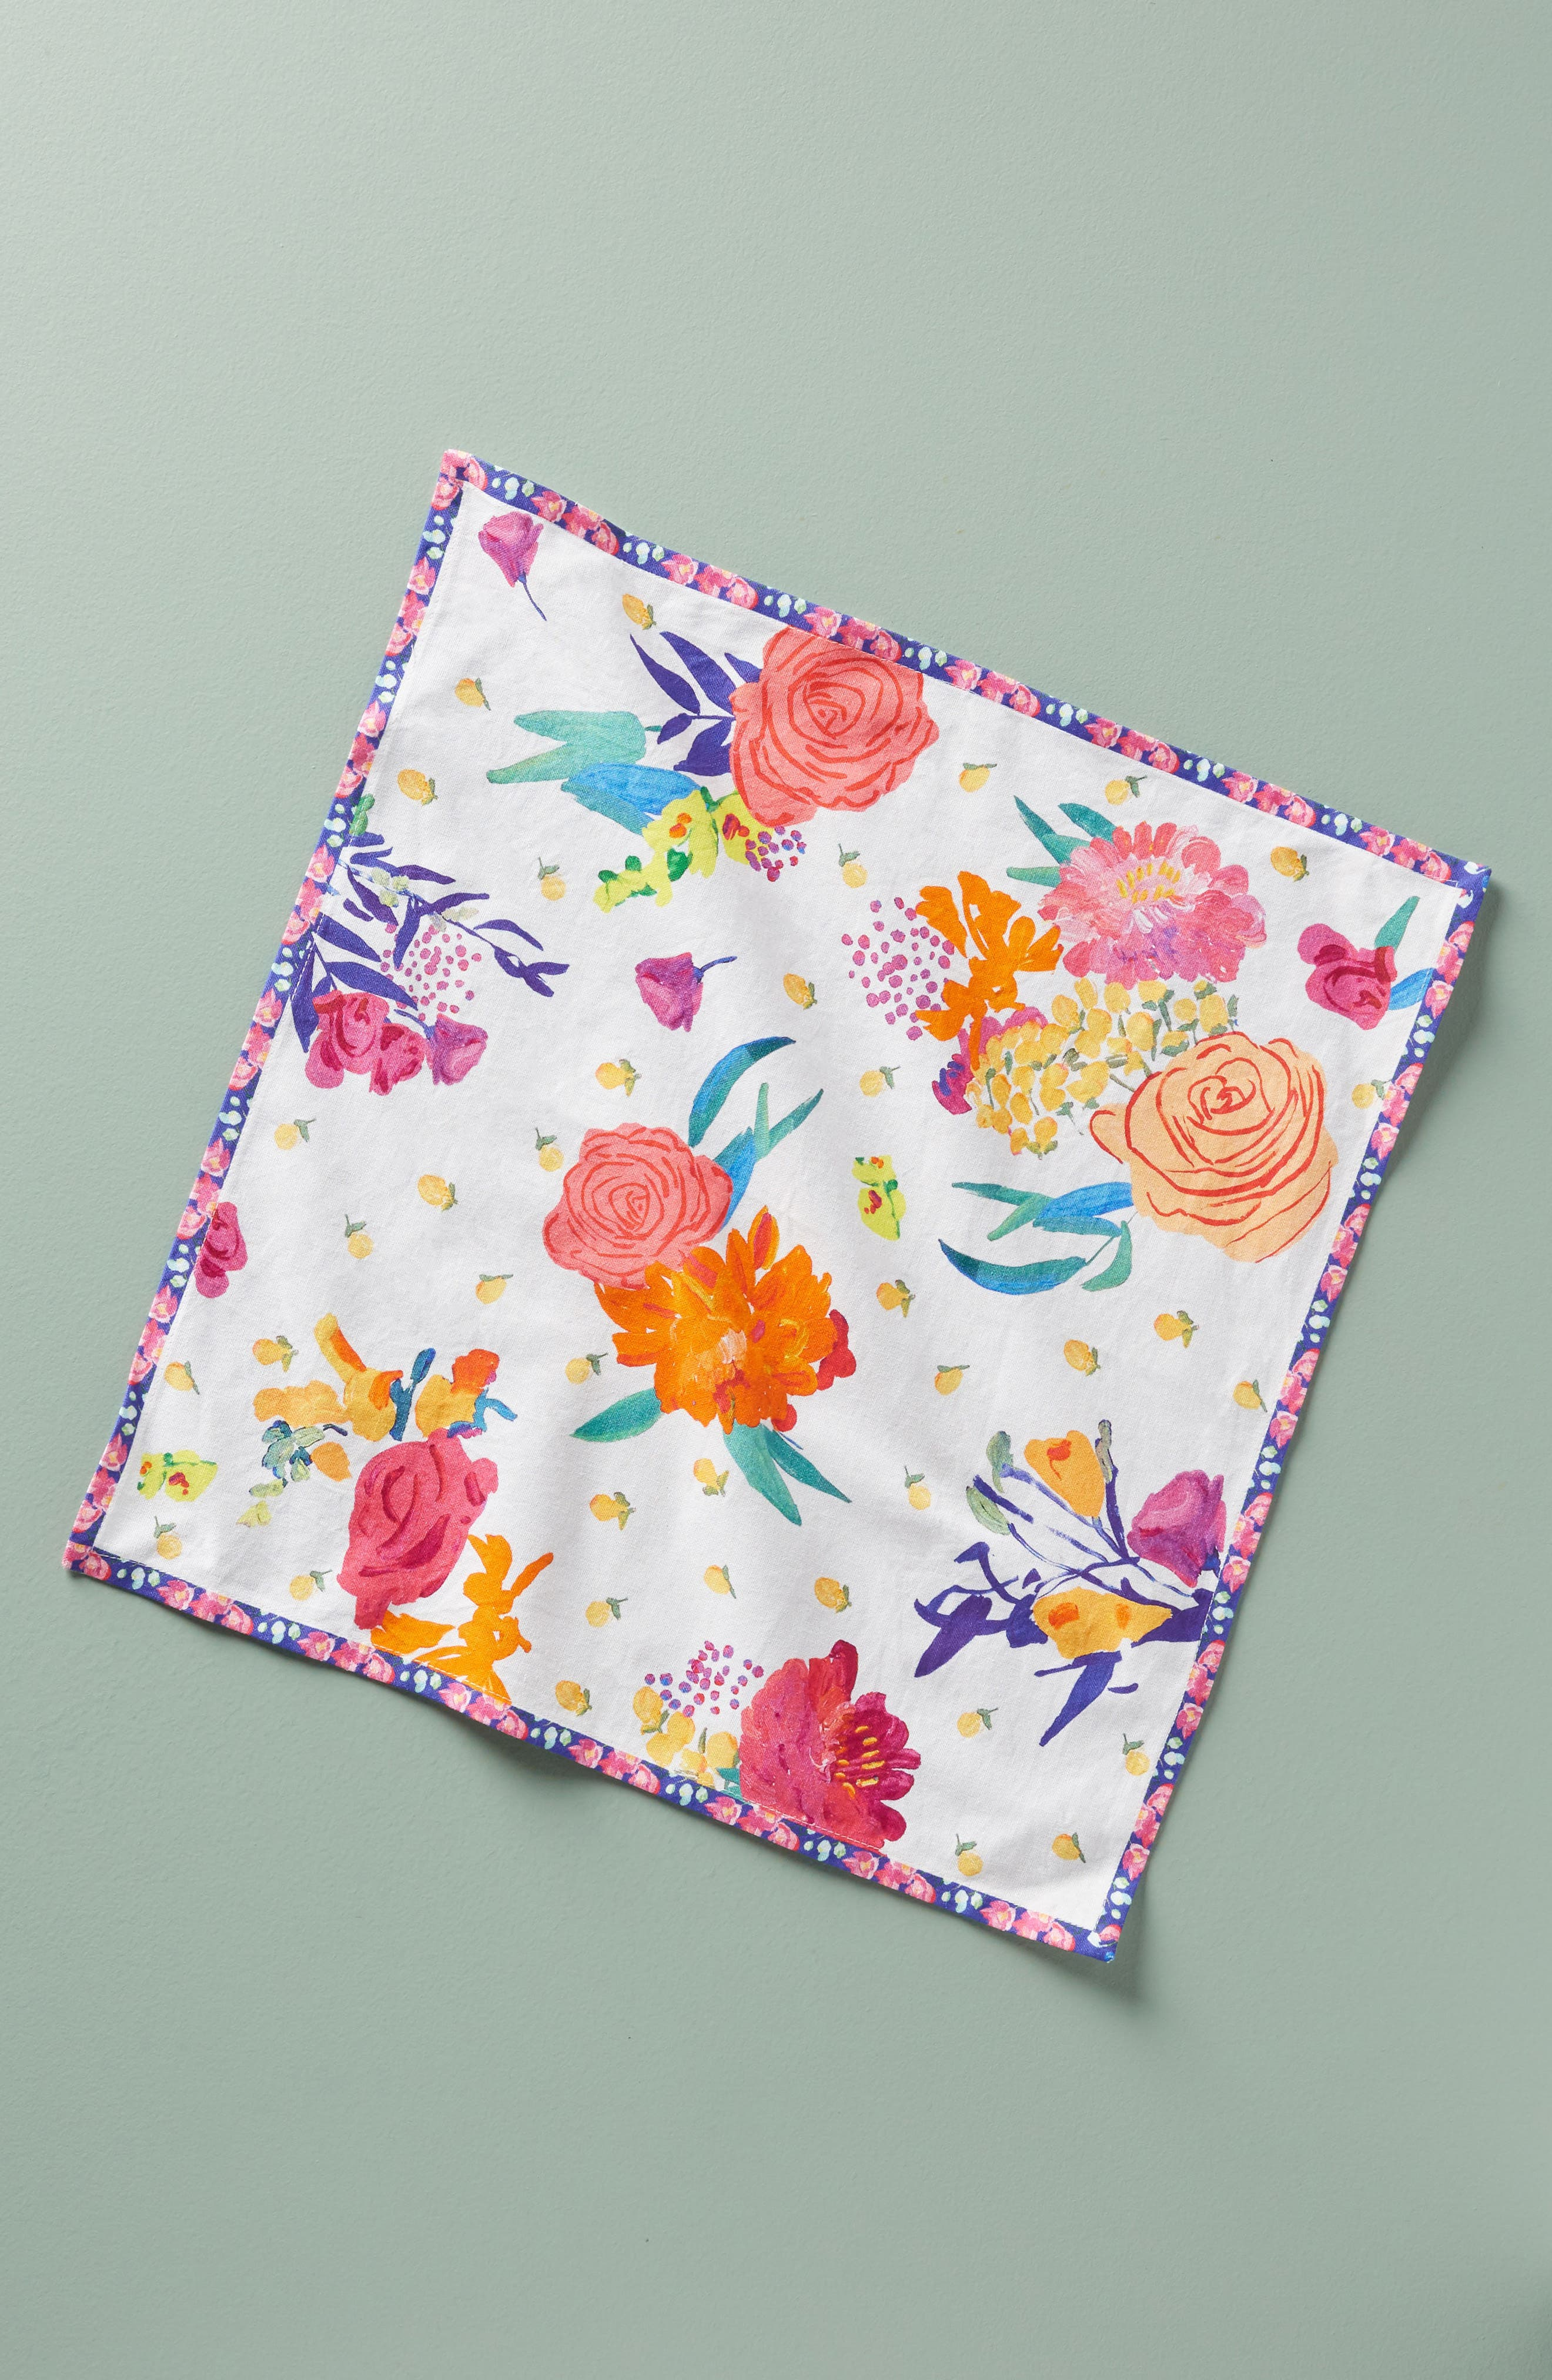 Paint + Petals Napkin,                         Main,                         color, 400